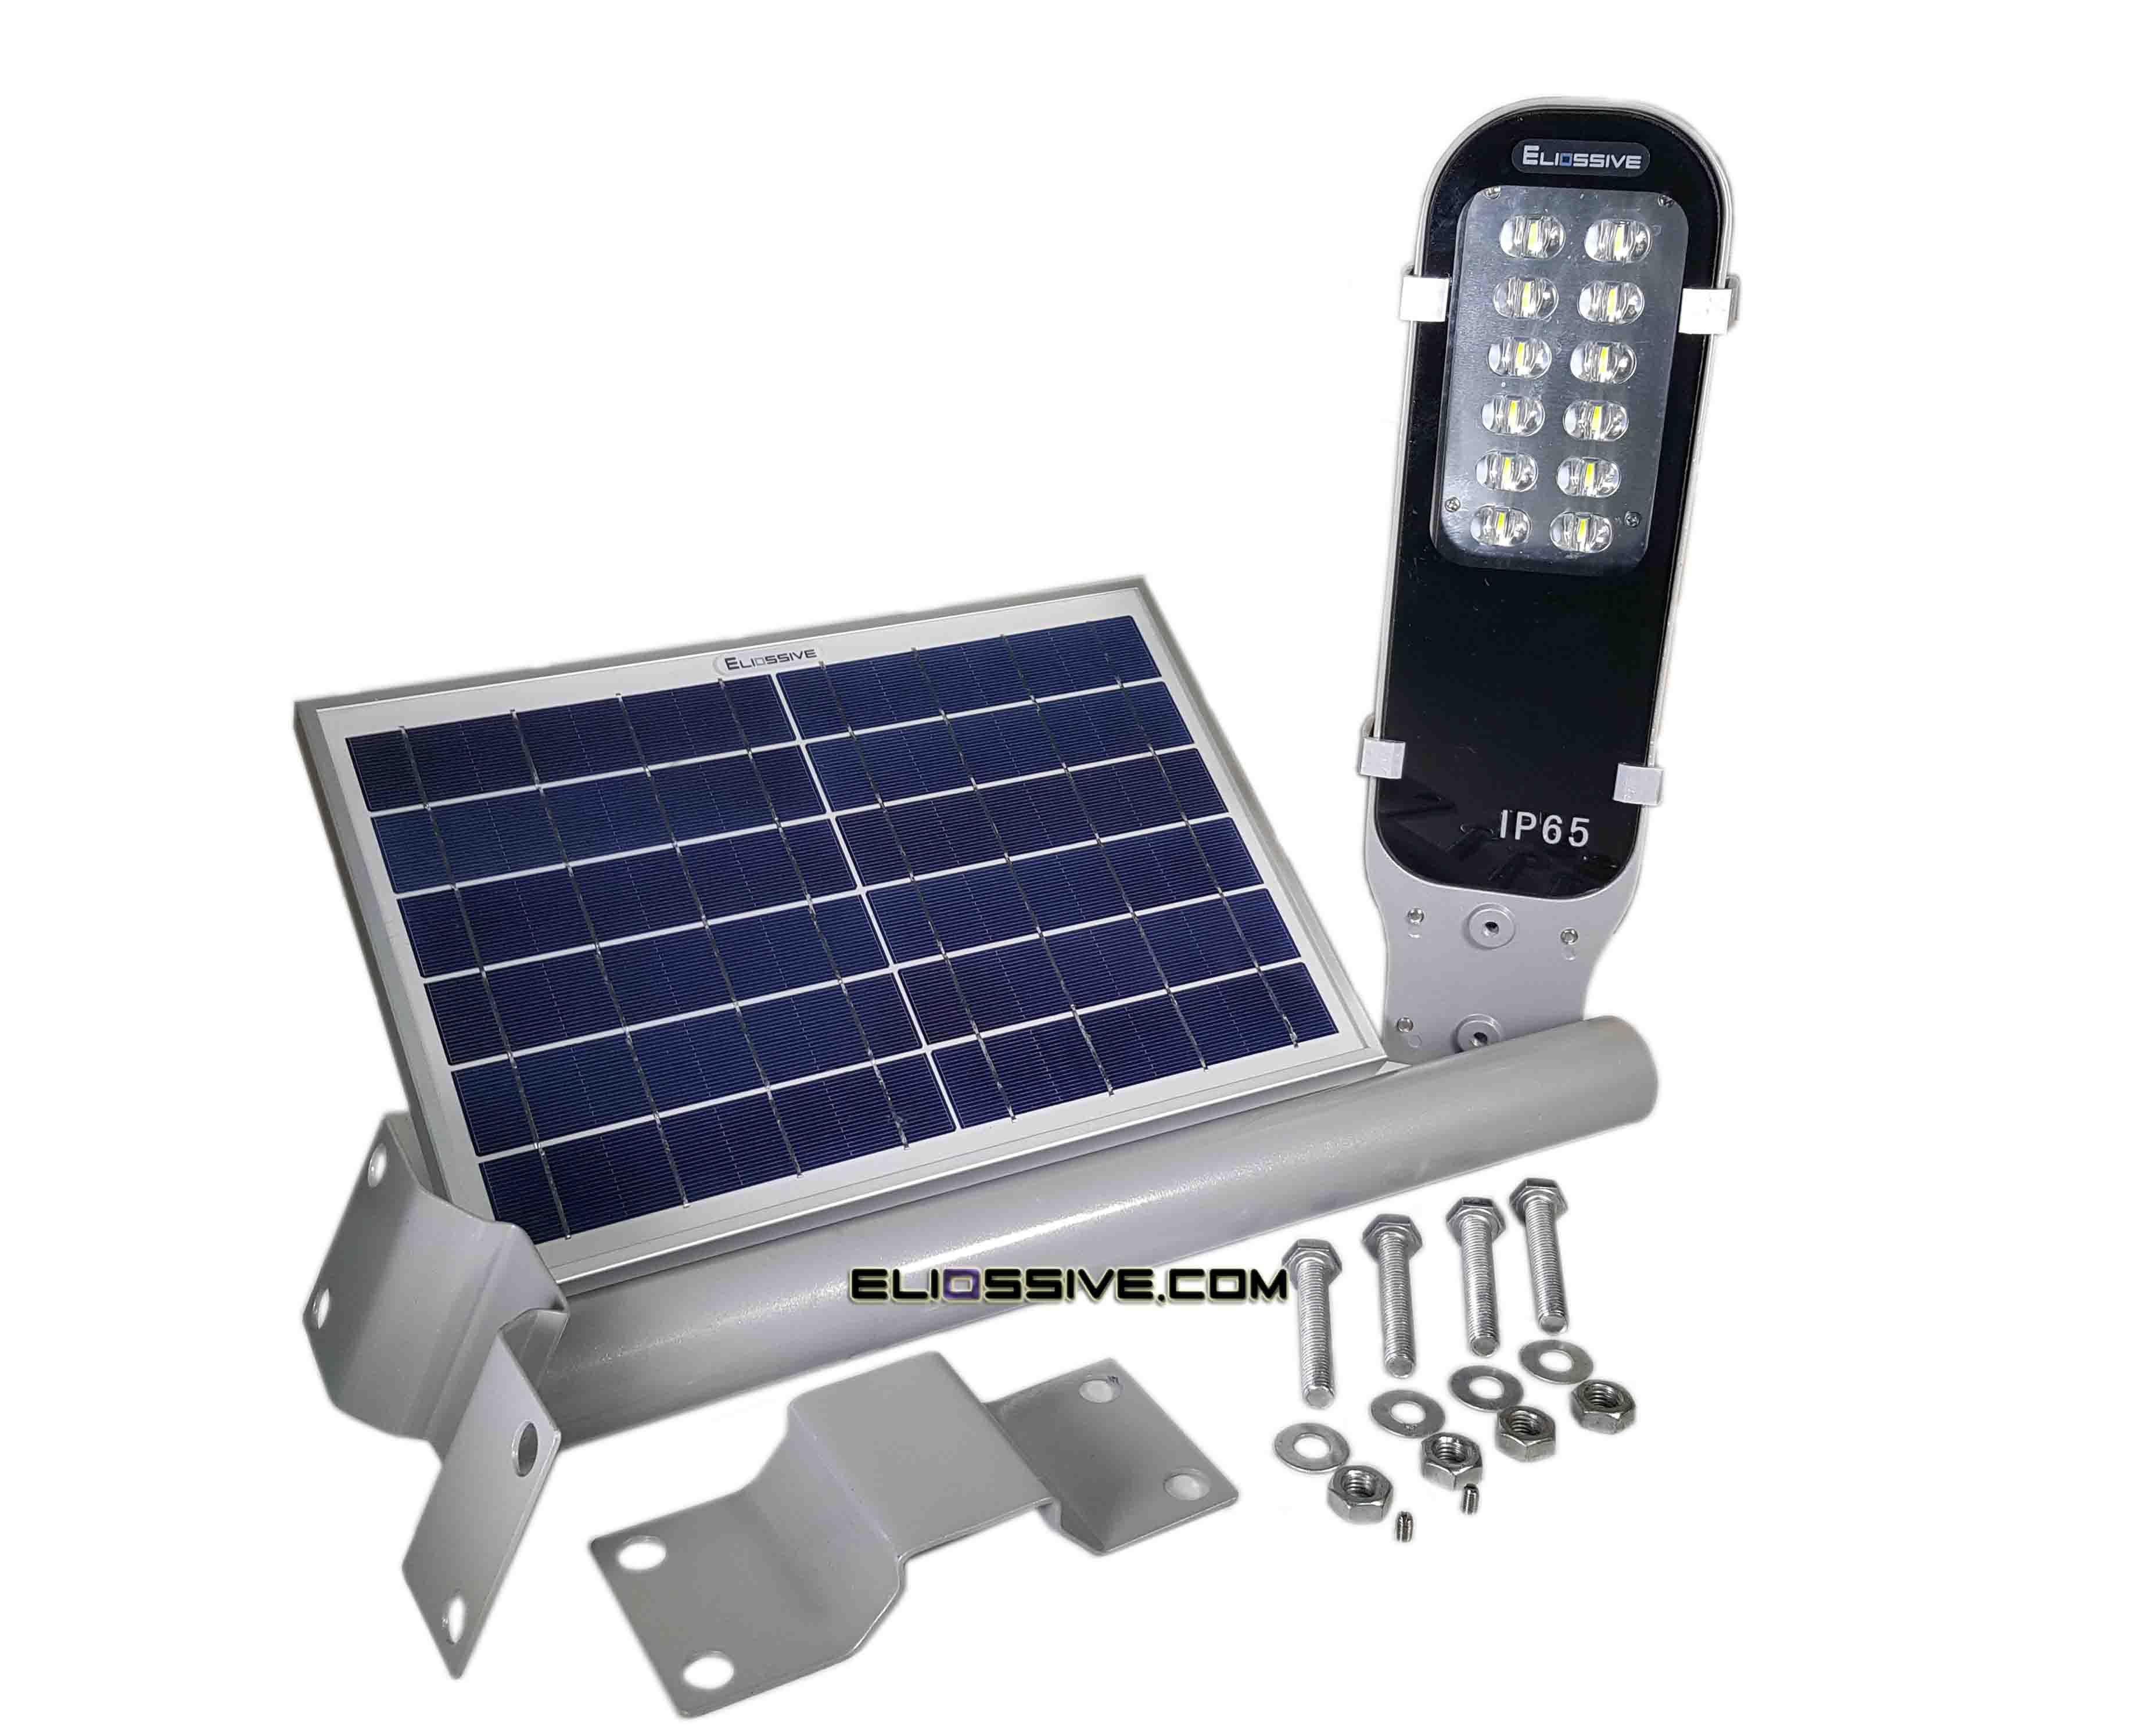 Budget Solar Street Light Eliossive